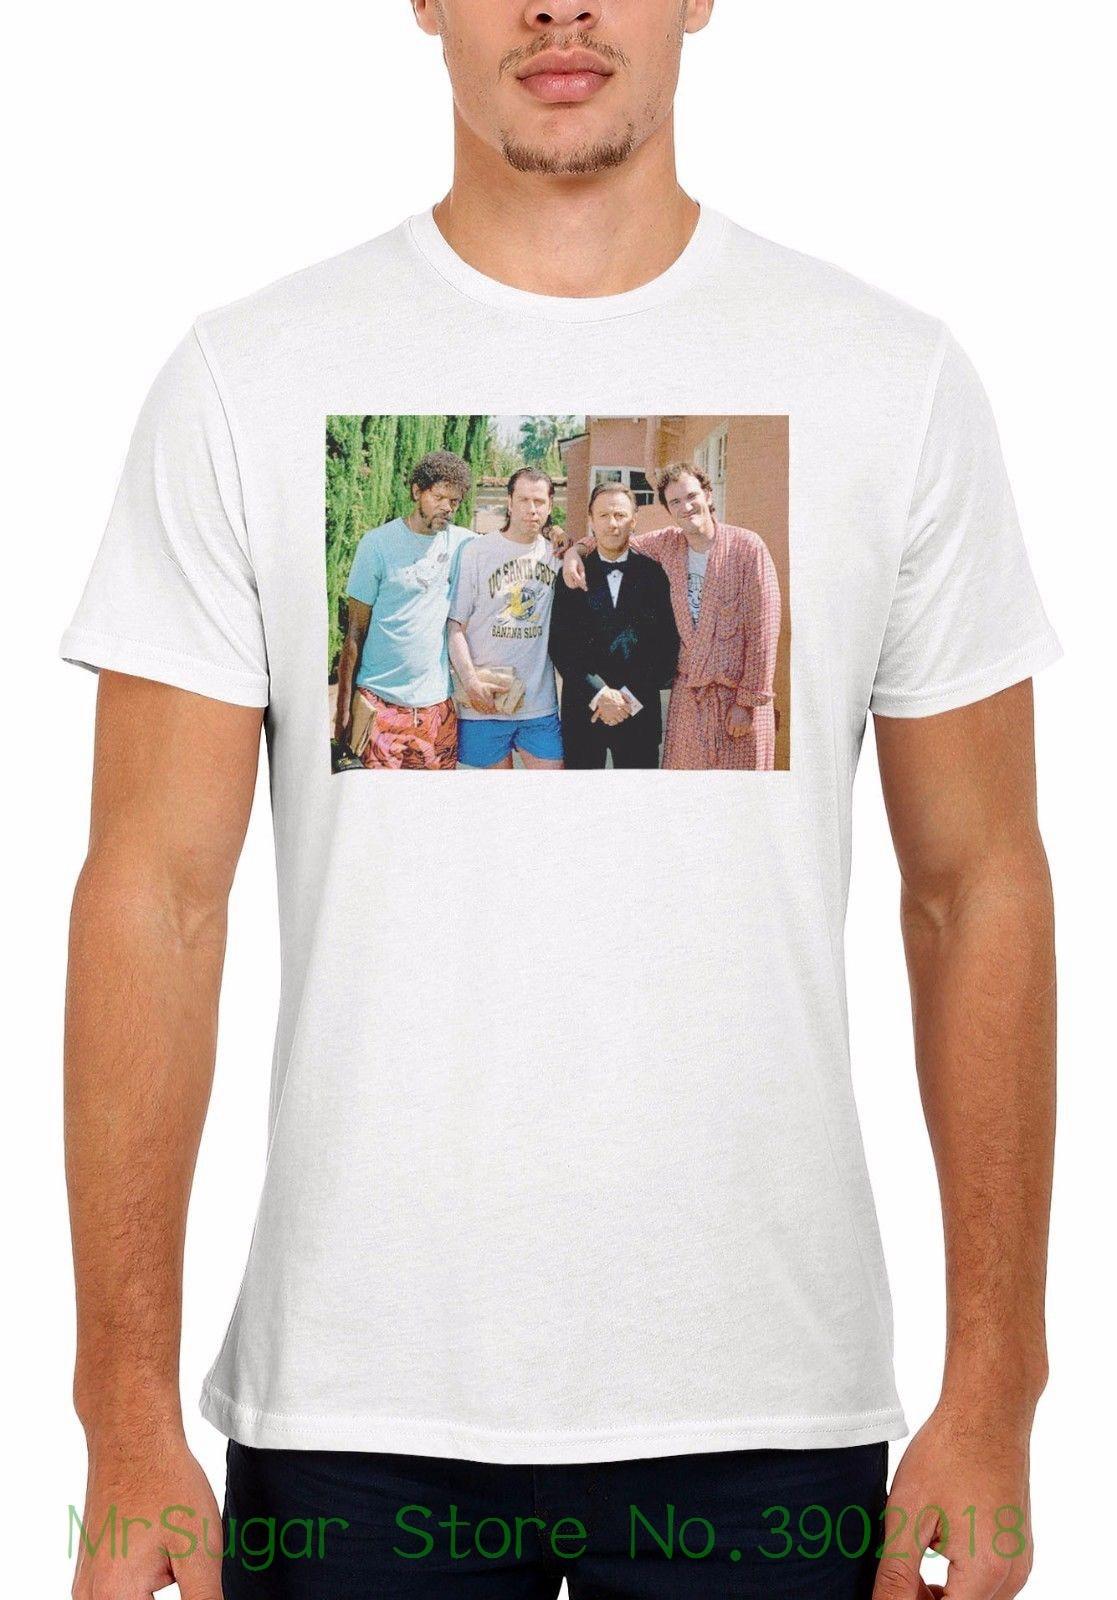 font-b-tarantino-b-font-travolta-pulp-fiction-men-women-unisex-t-shirt-2041-top-quality-cotton-casual-men-t-shirts-men-free-shipping